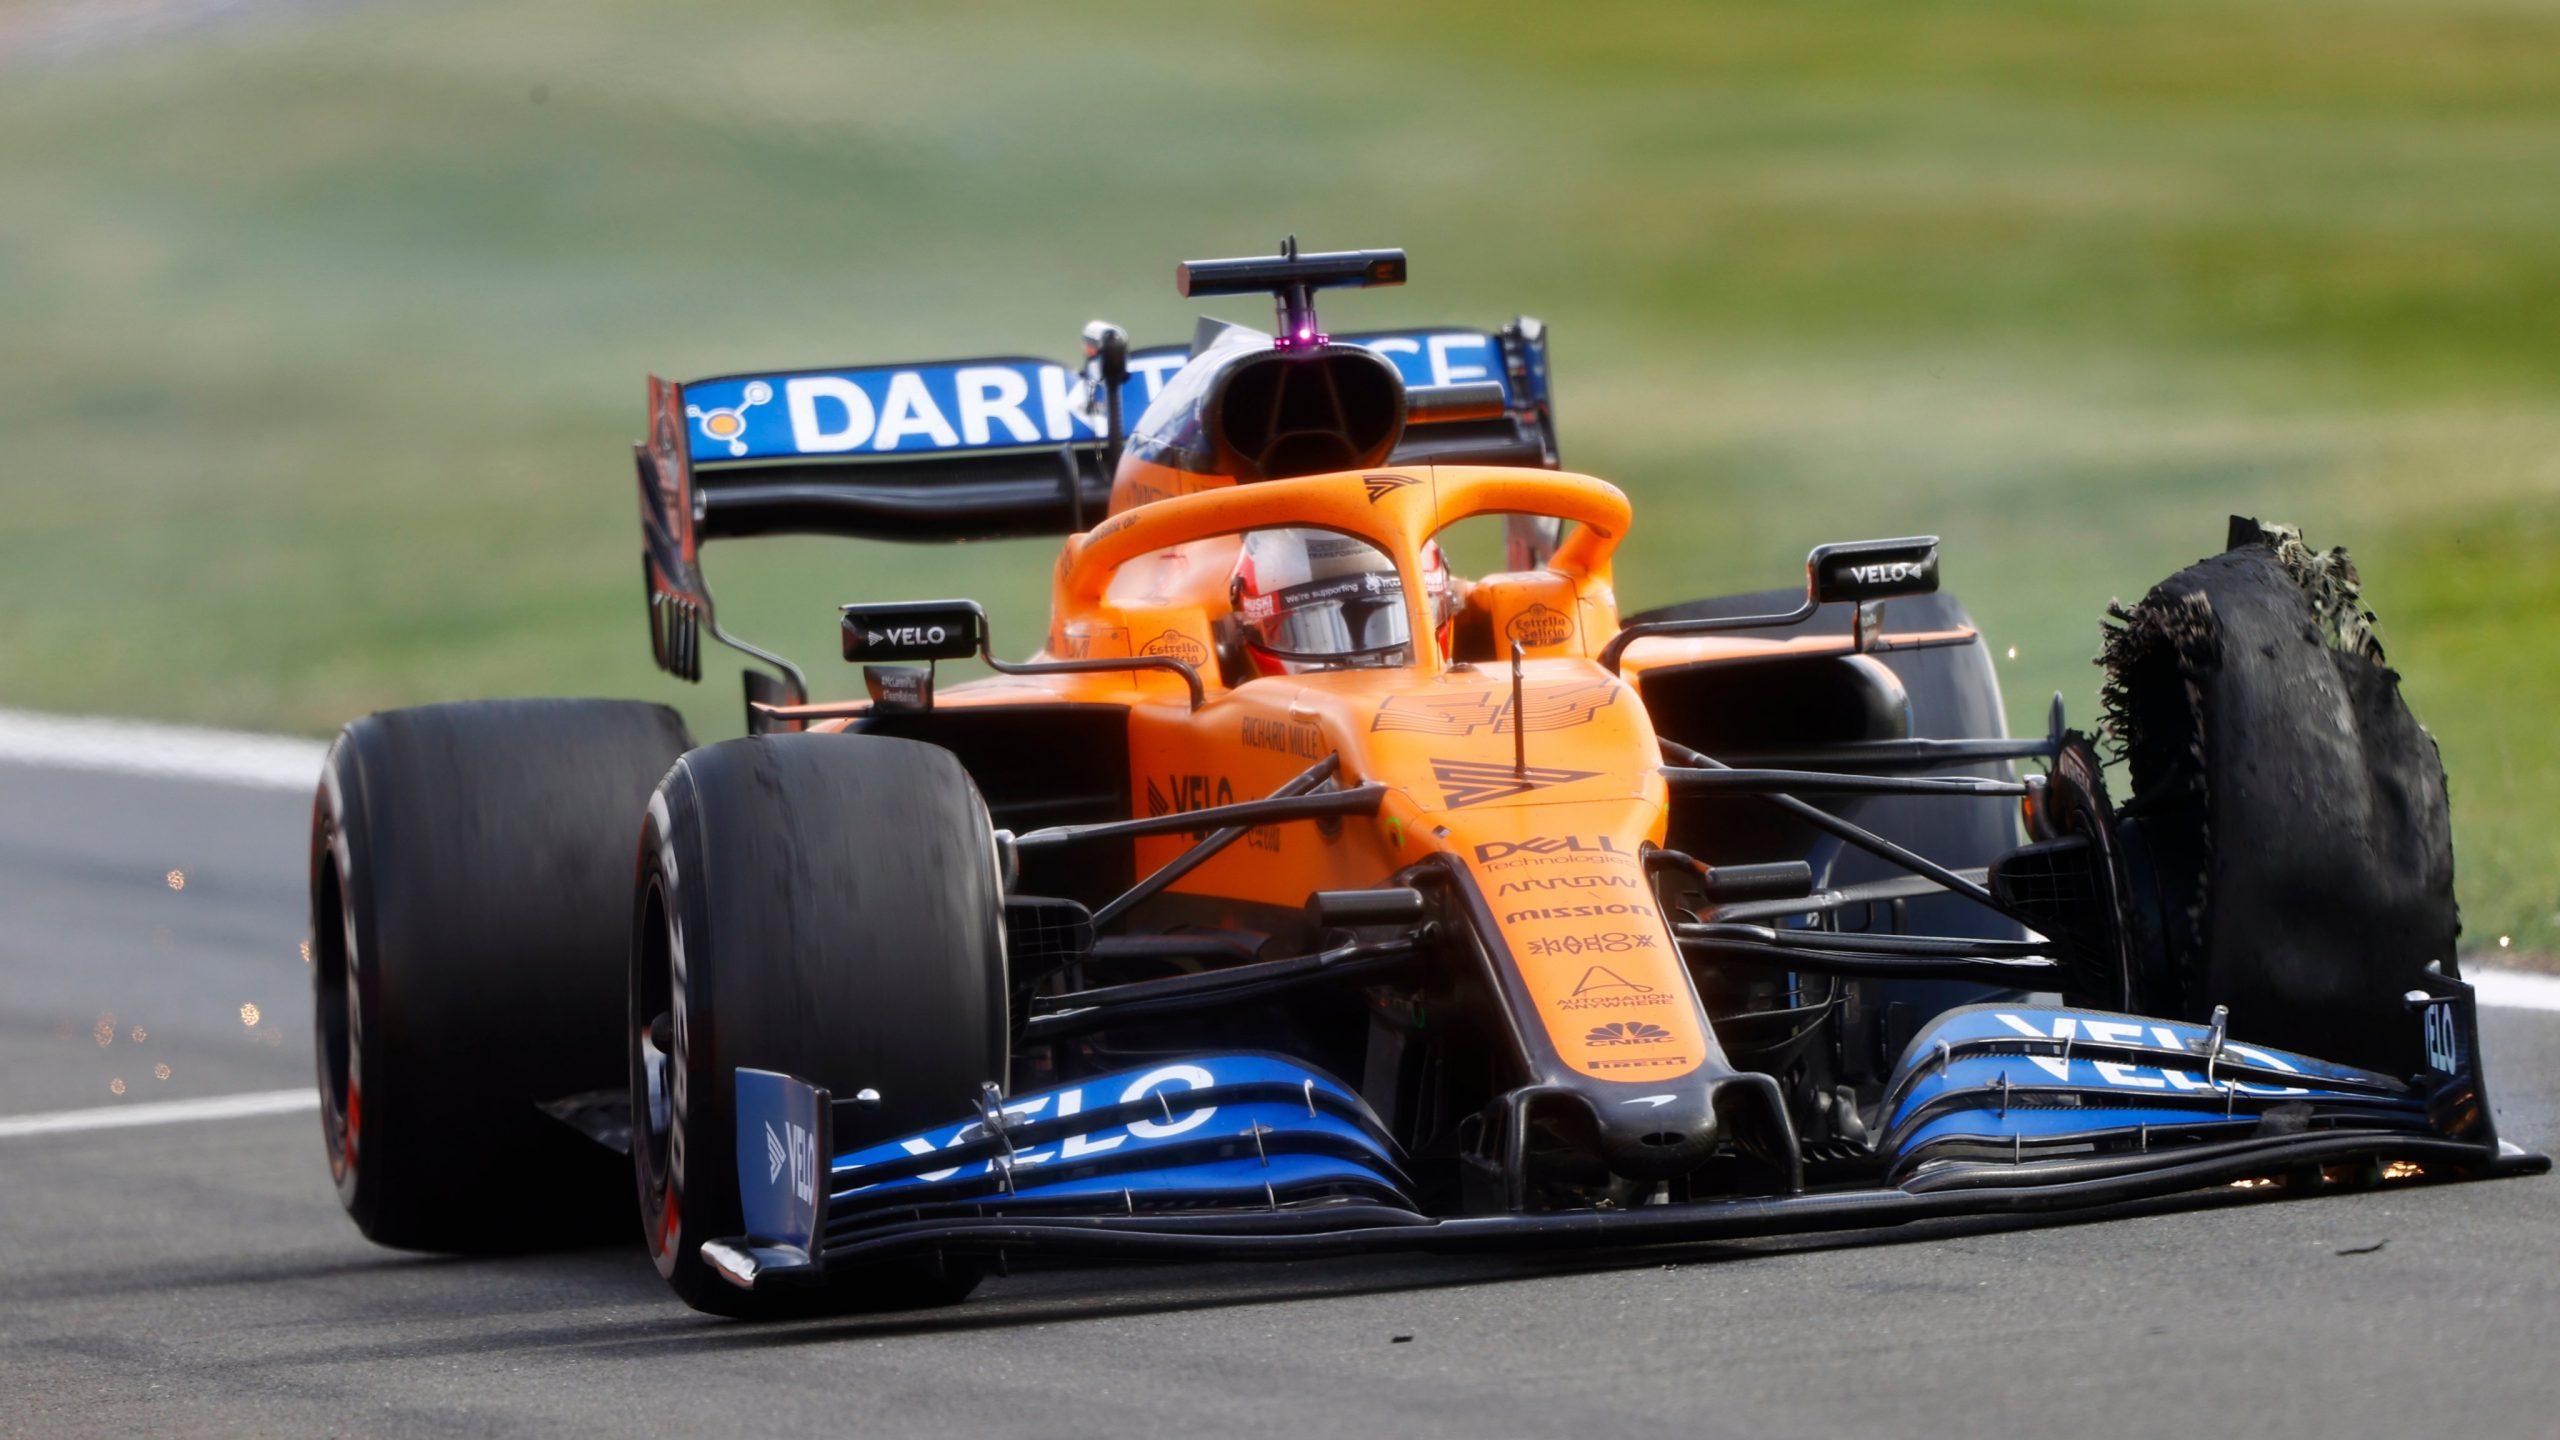 F1 - Carlos Sainz furieux contre l'attitude dangereuse de Romain Grosjean en course